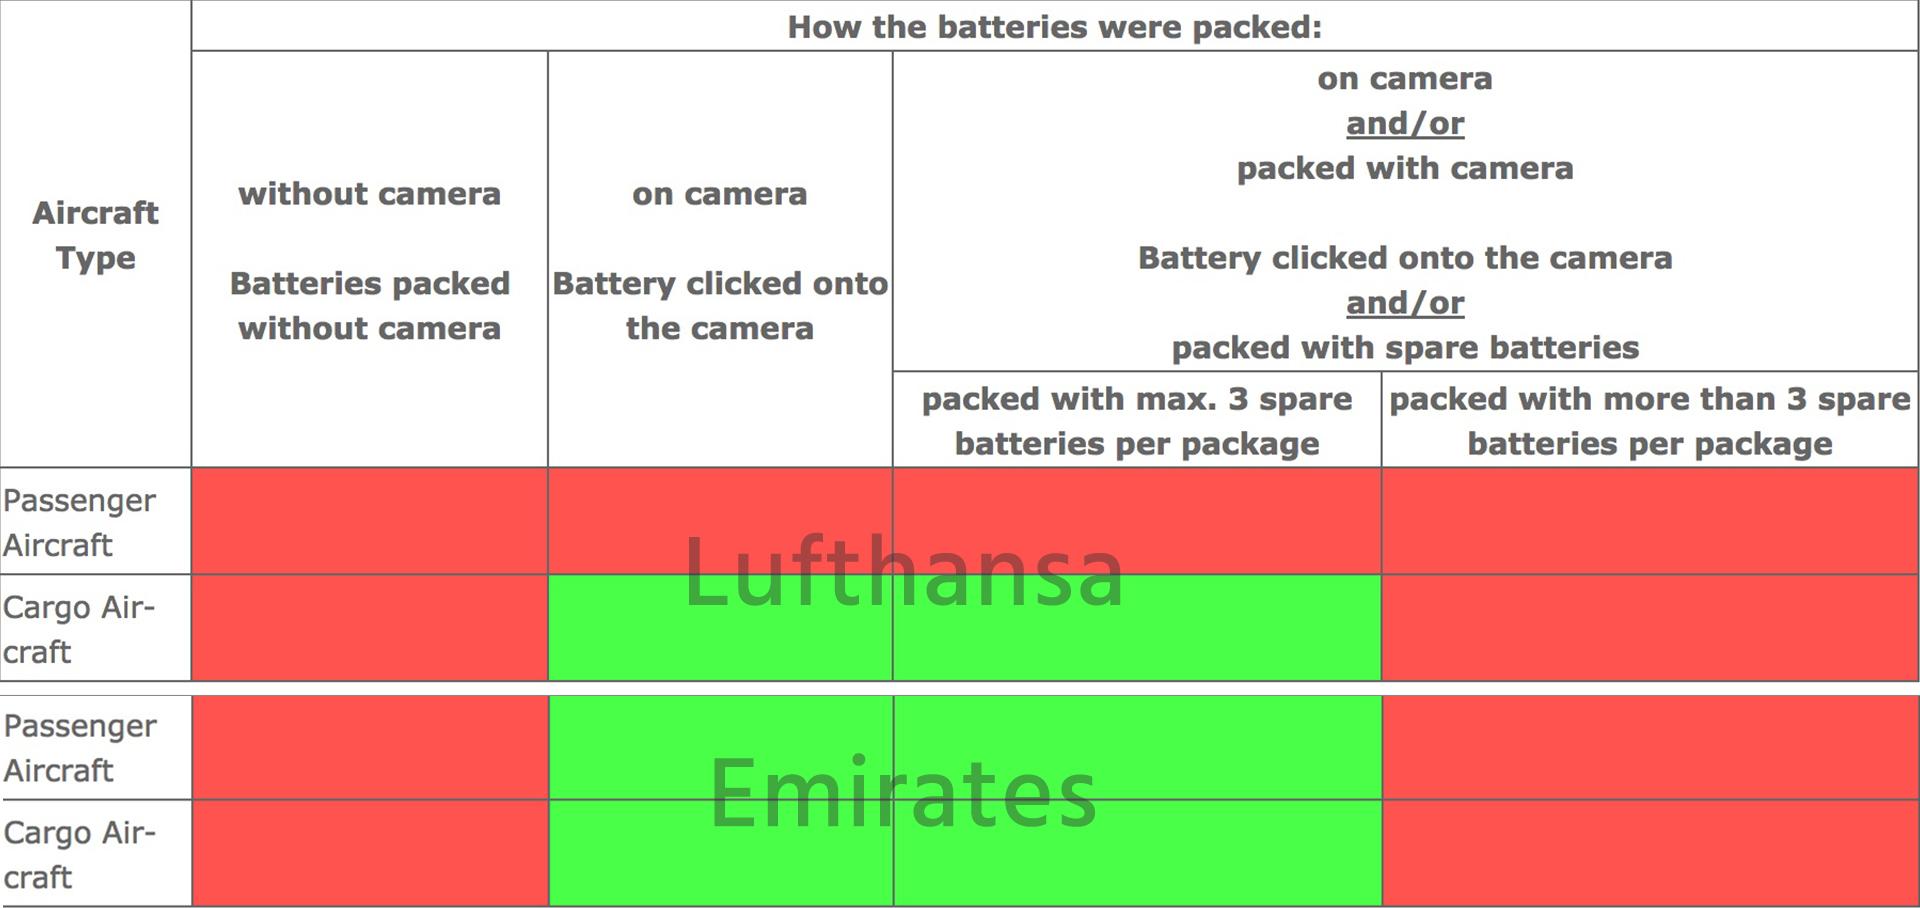 cine batteries